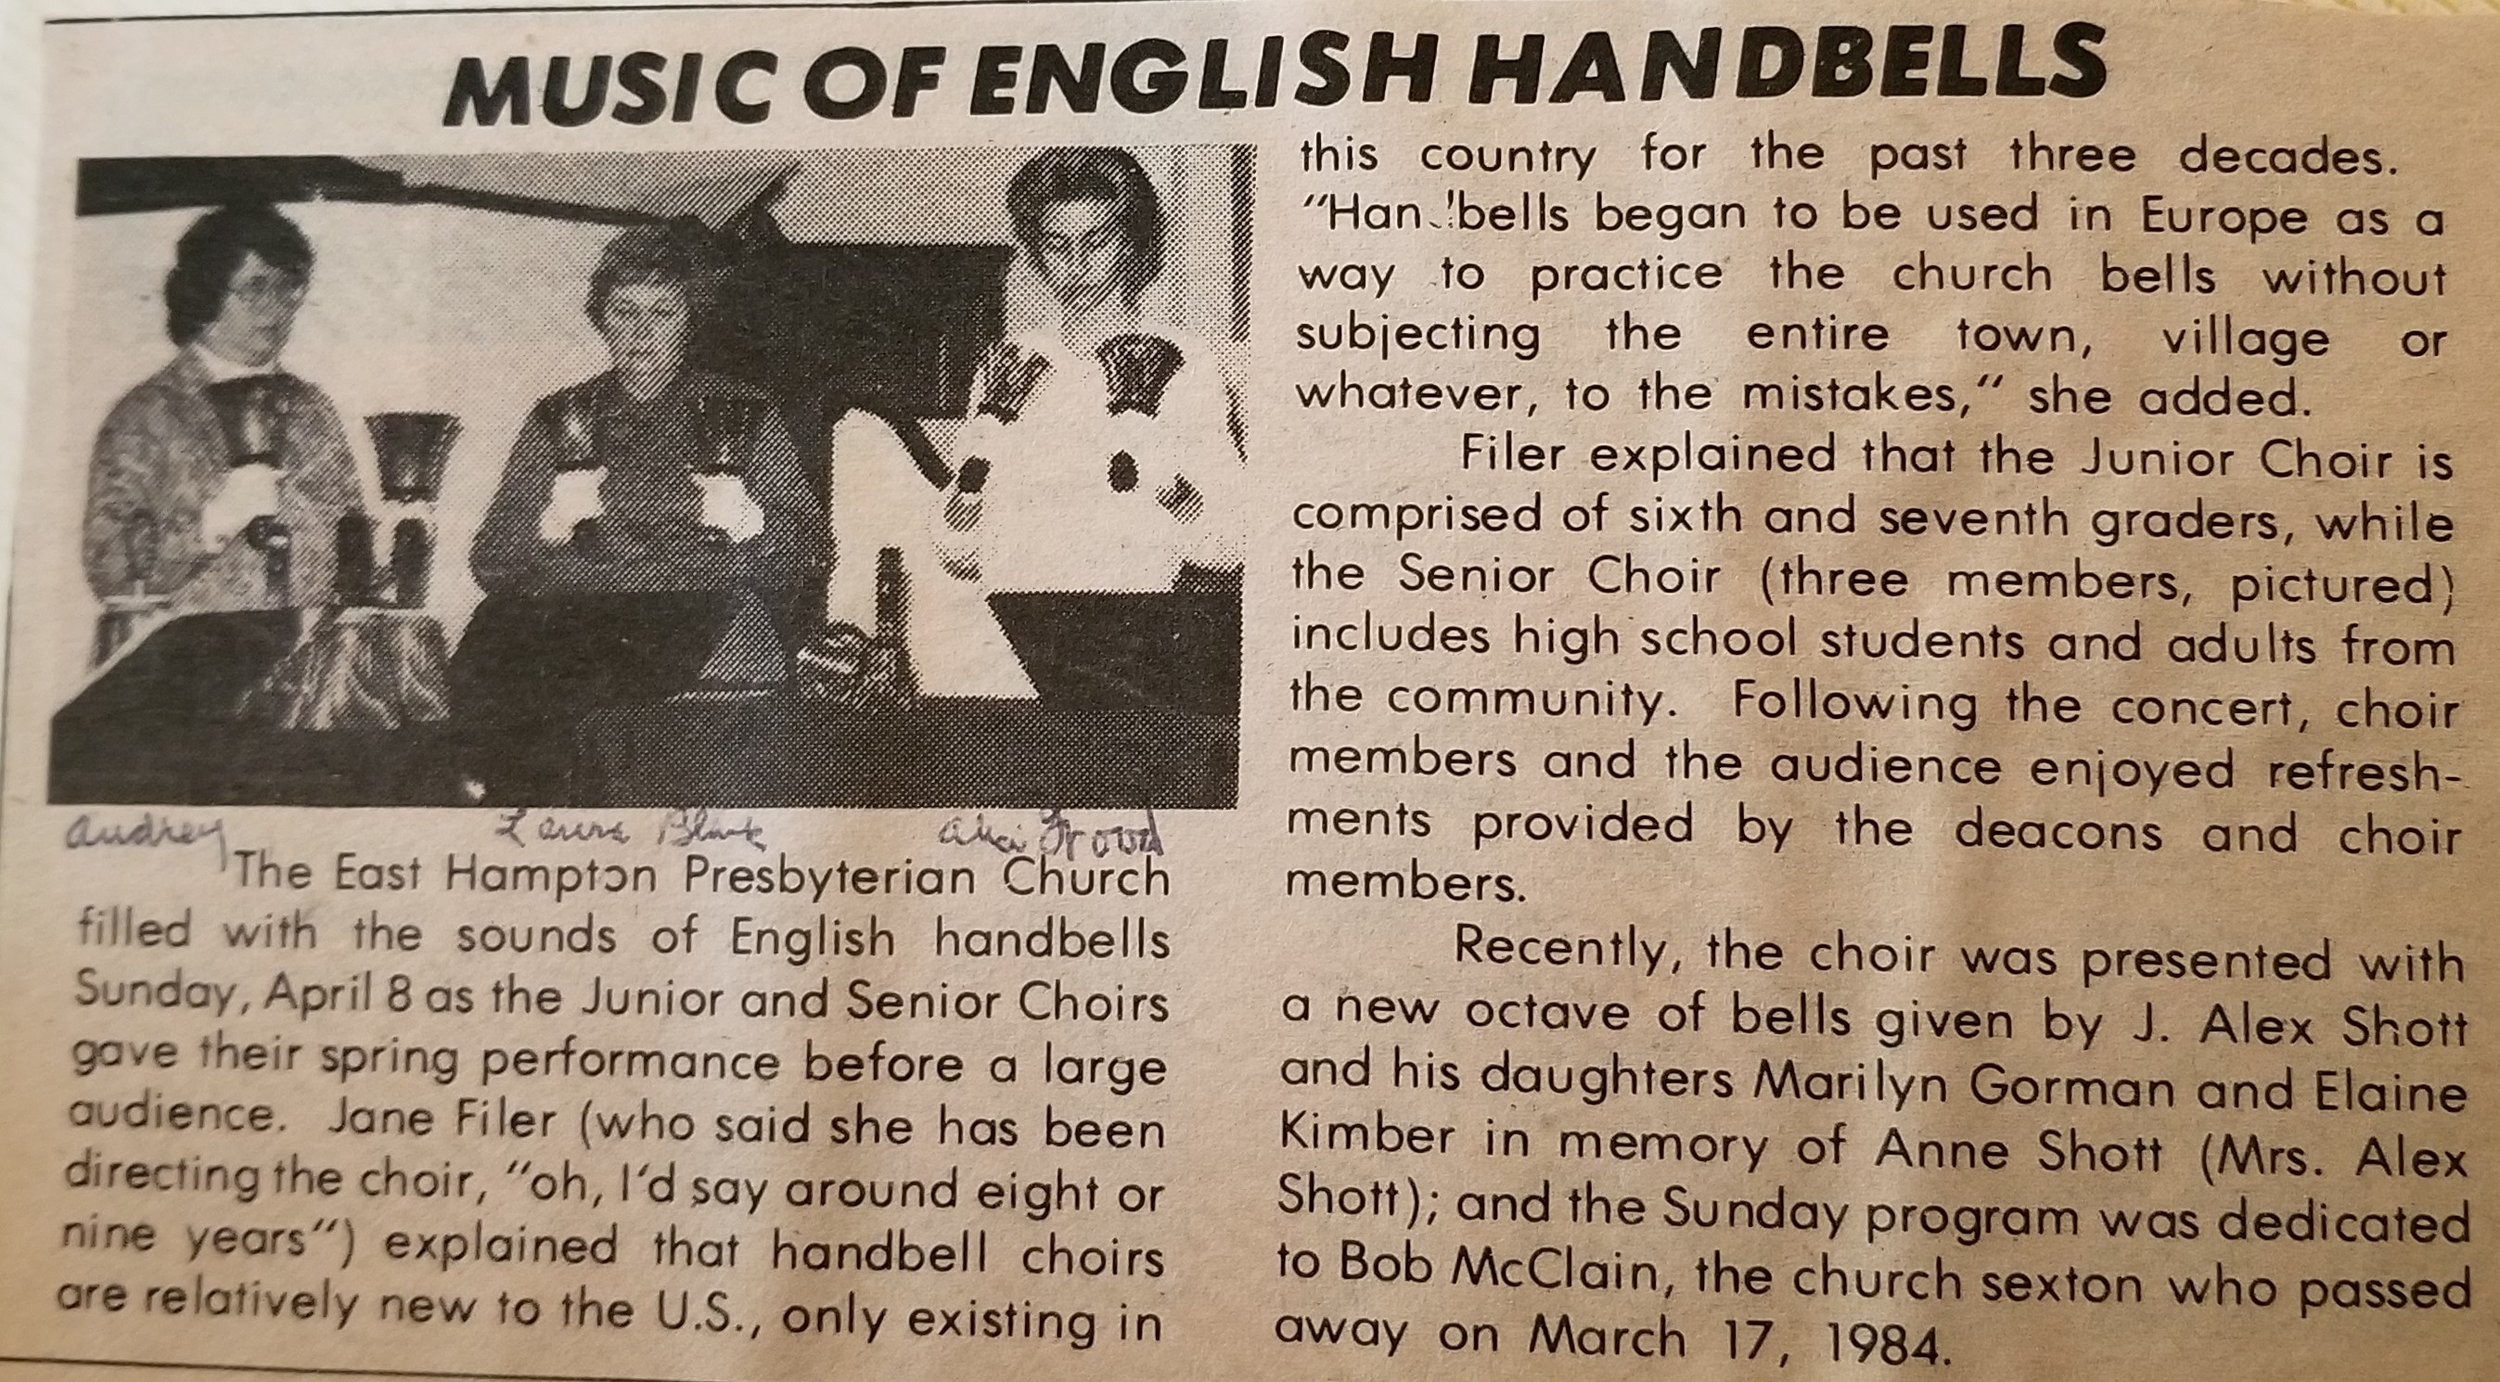 Music of English Handbells